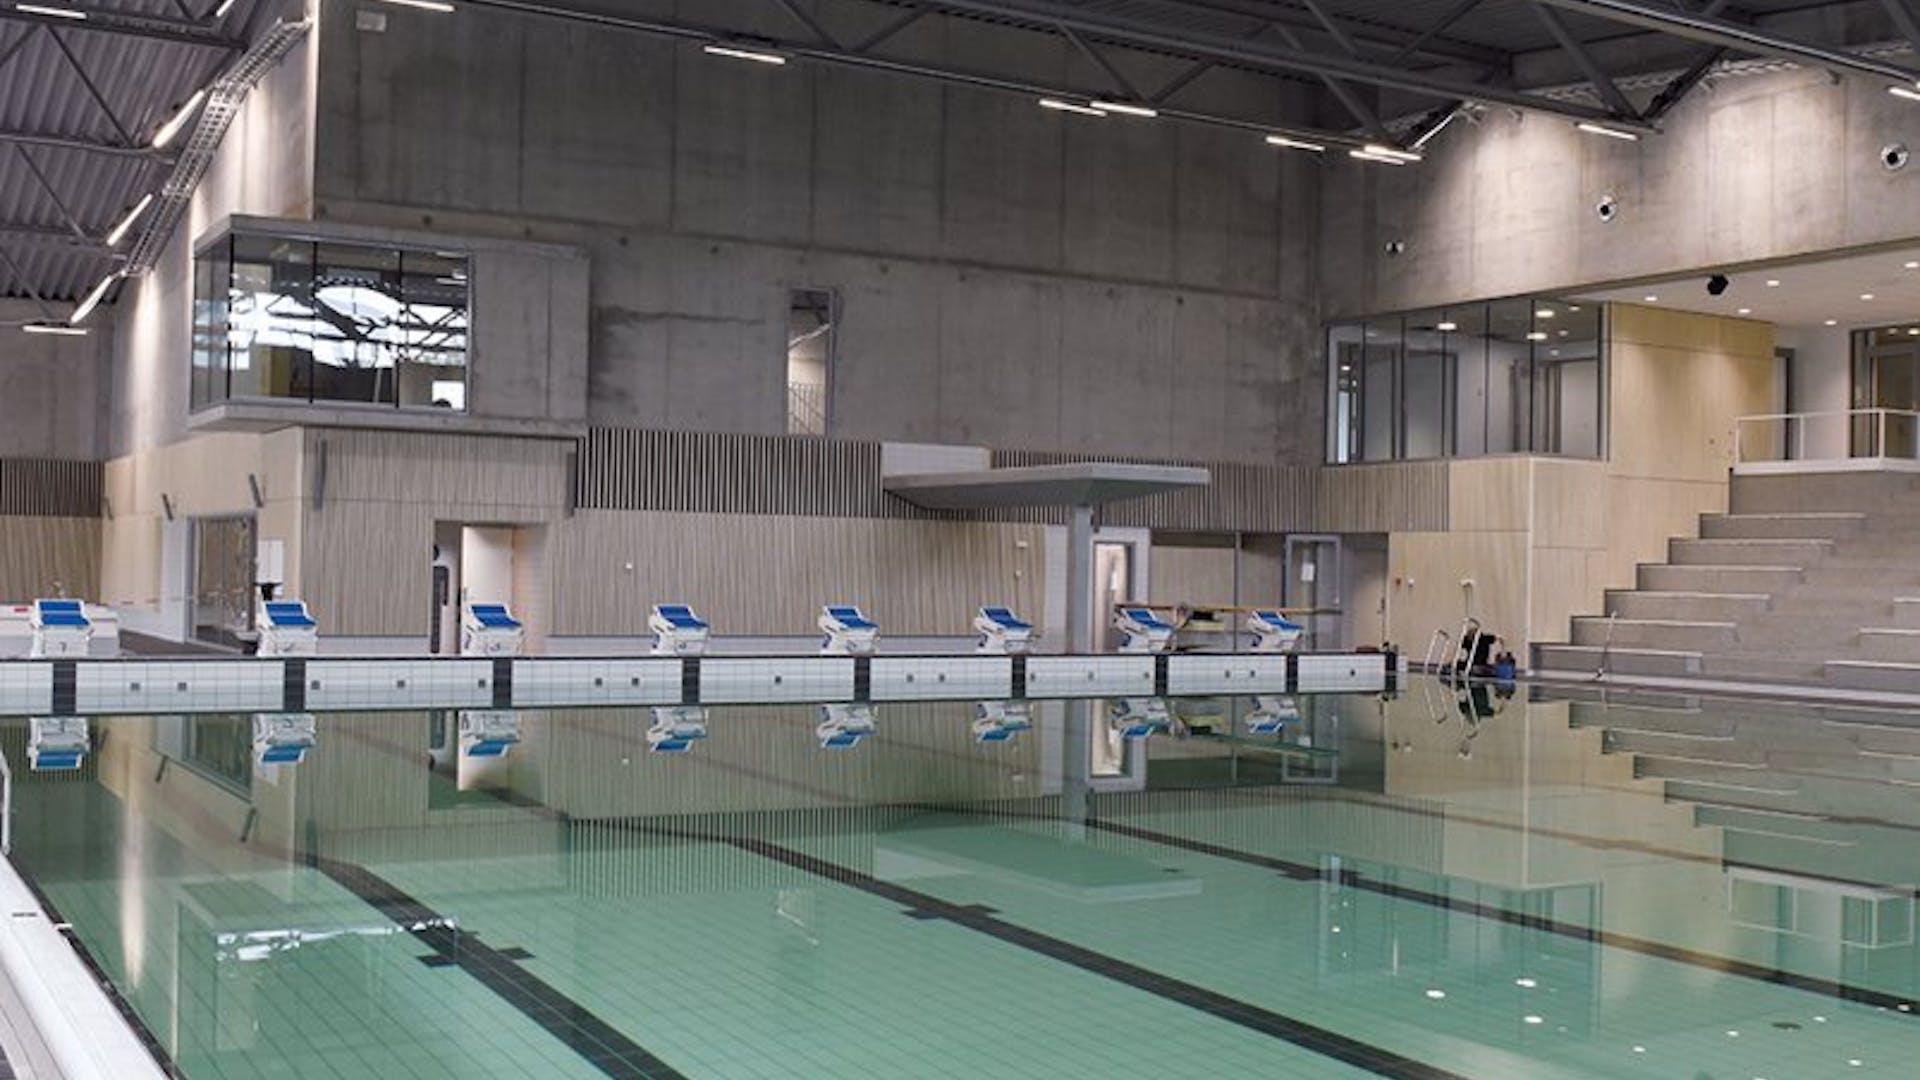 svømmehall 3